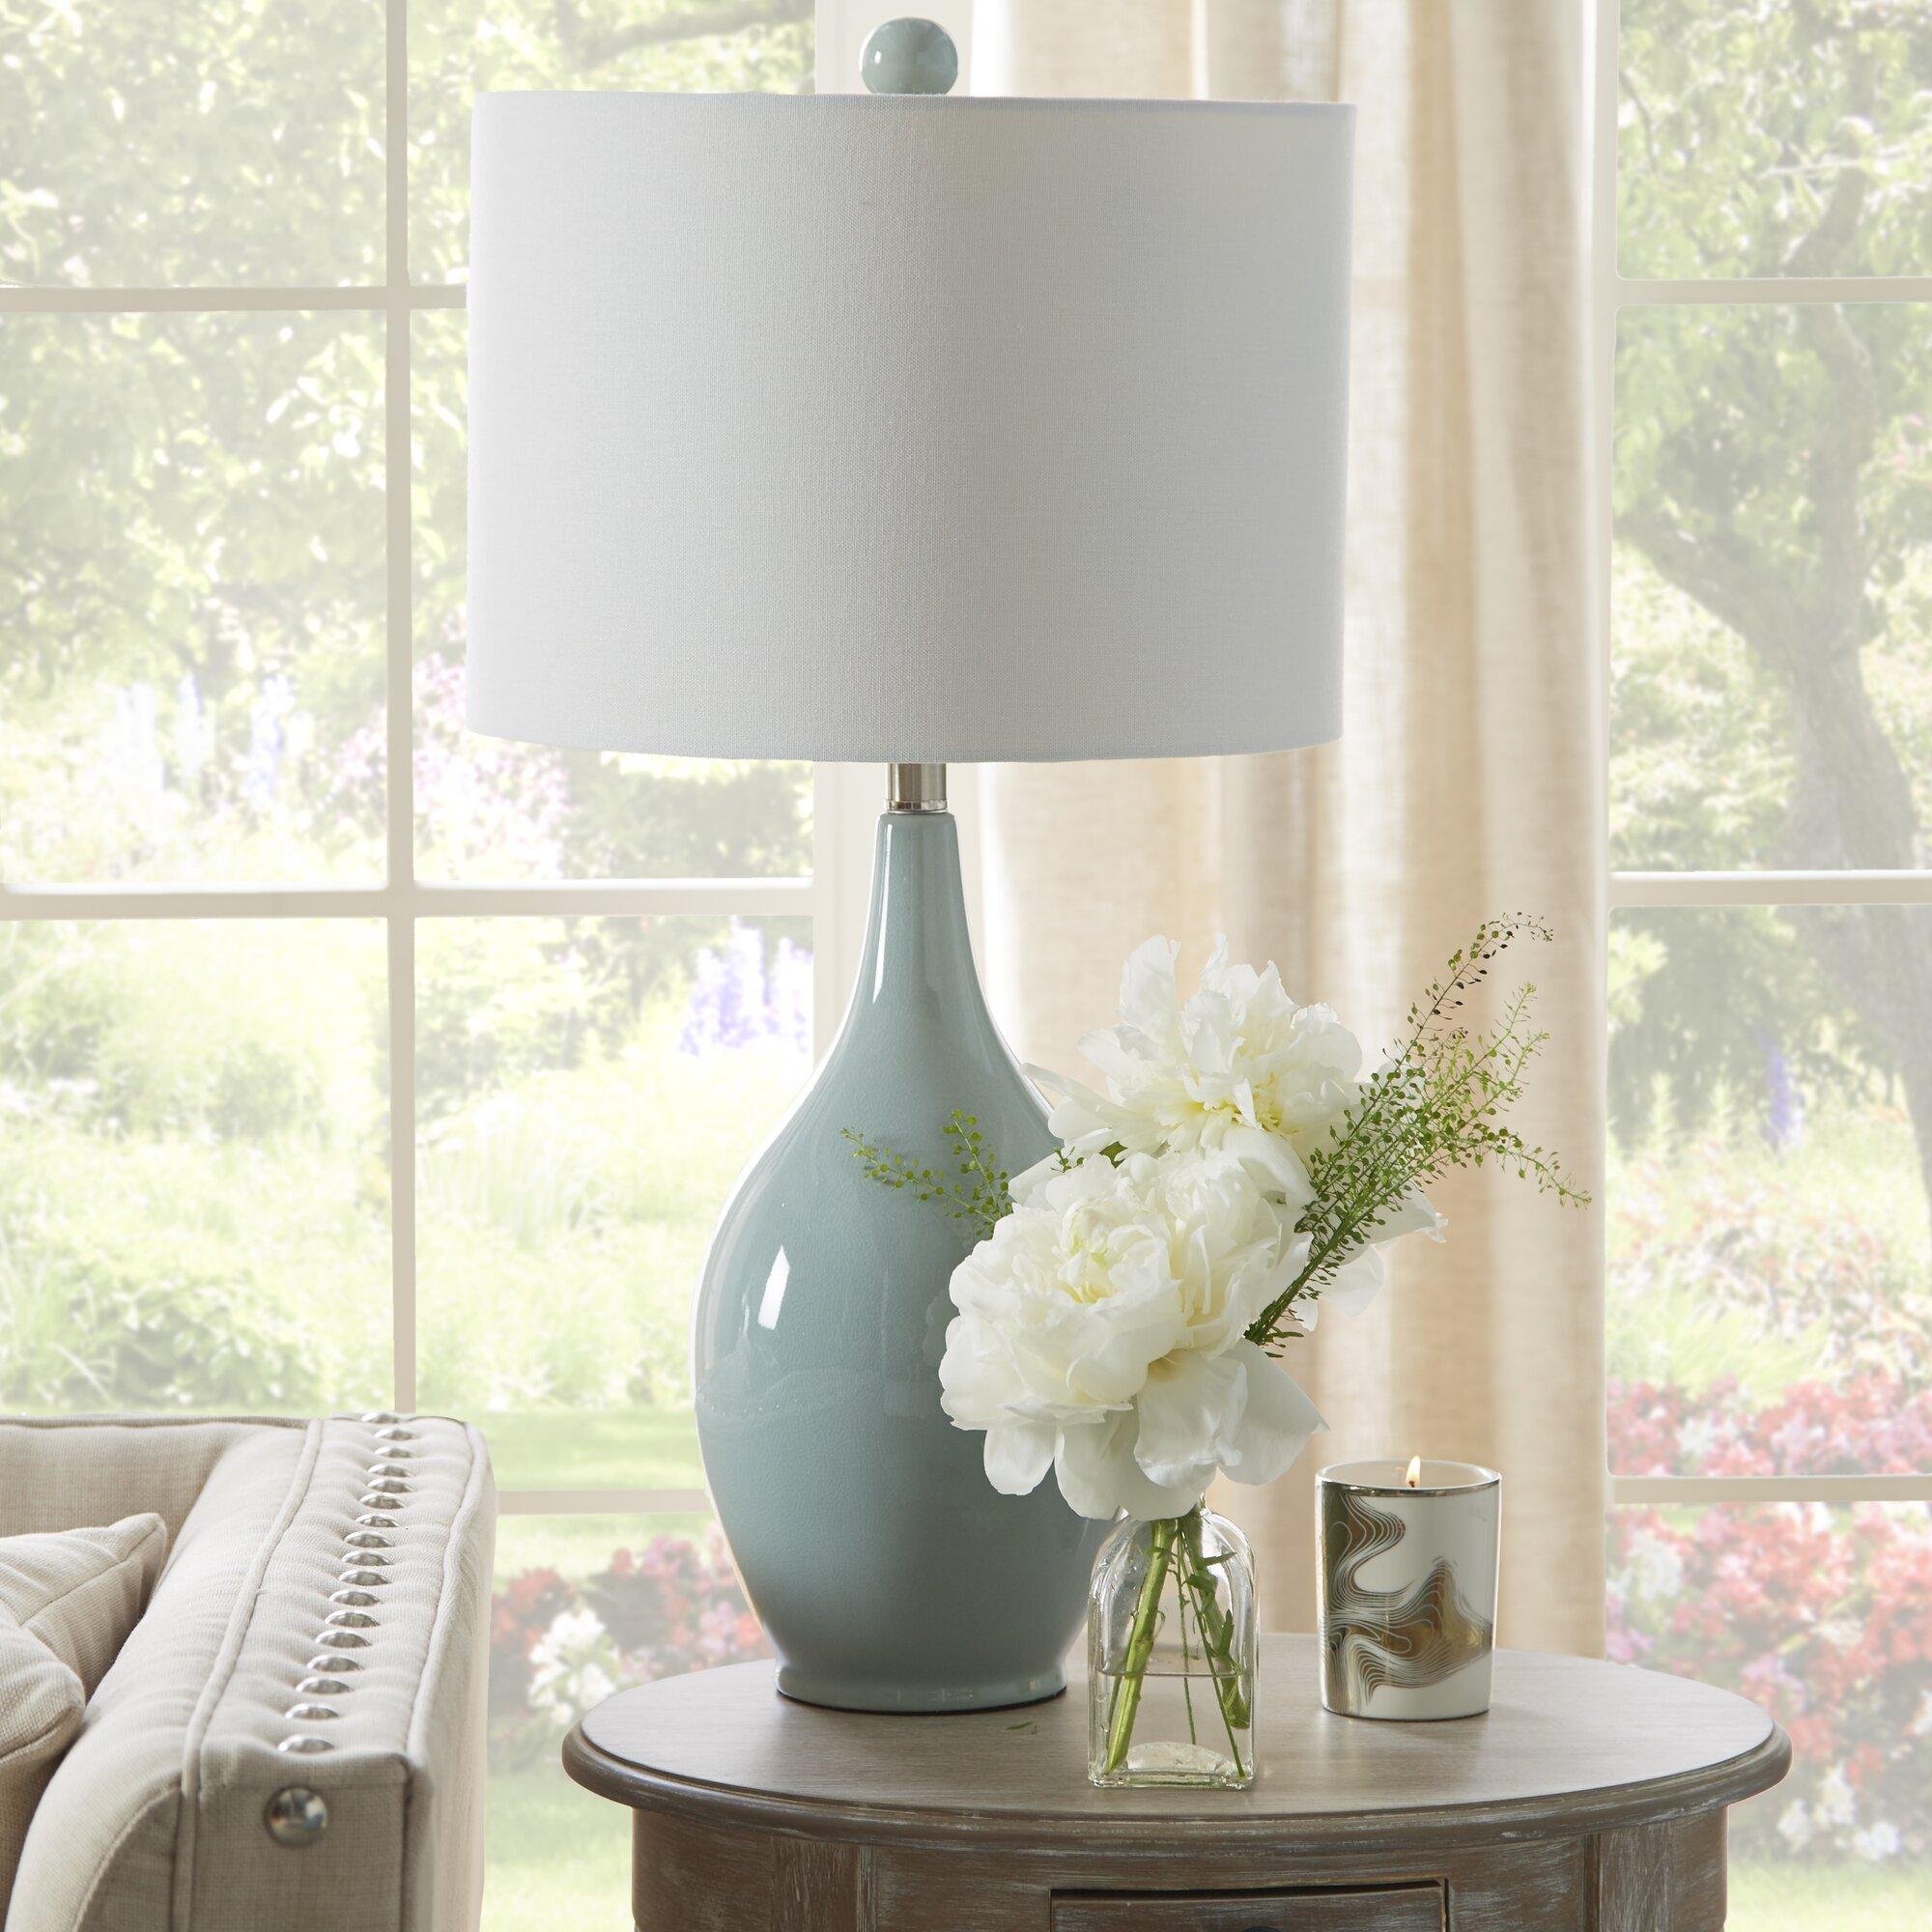 Contemporary orange table lamps - Miltiades 27 Table Lamp